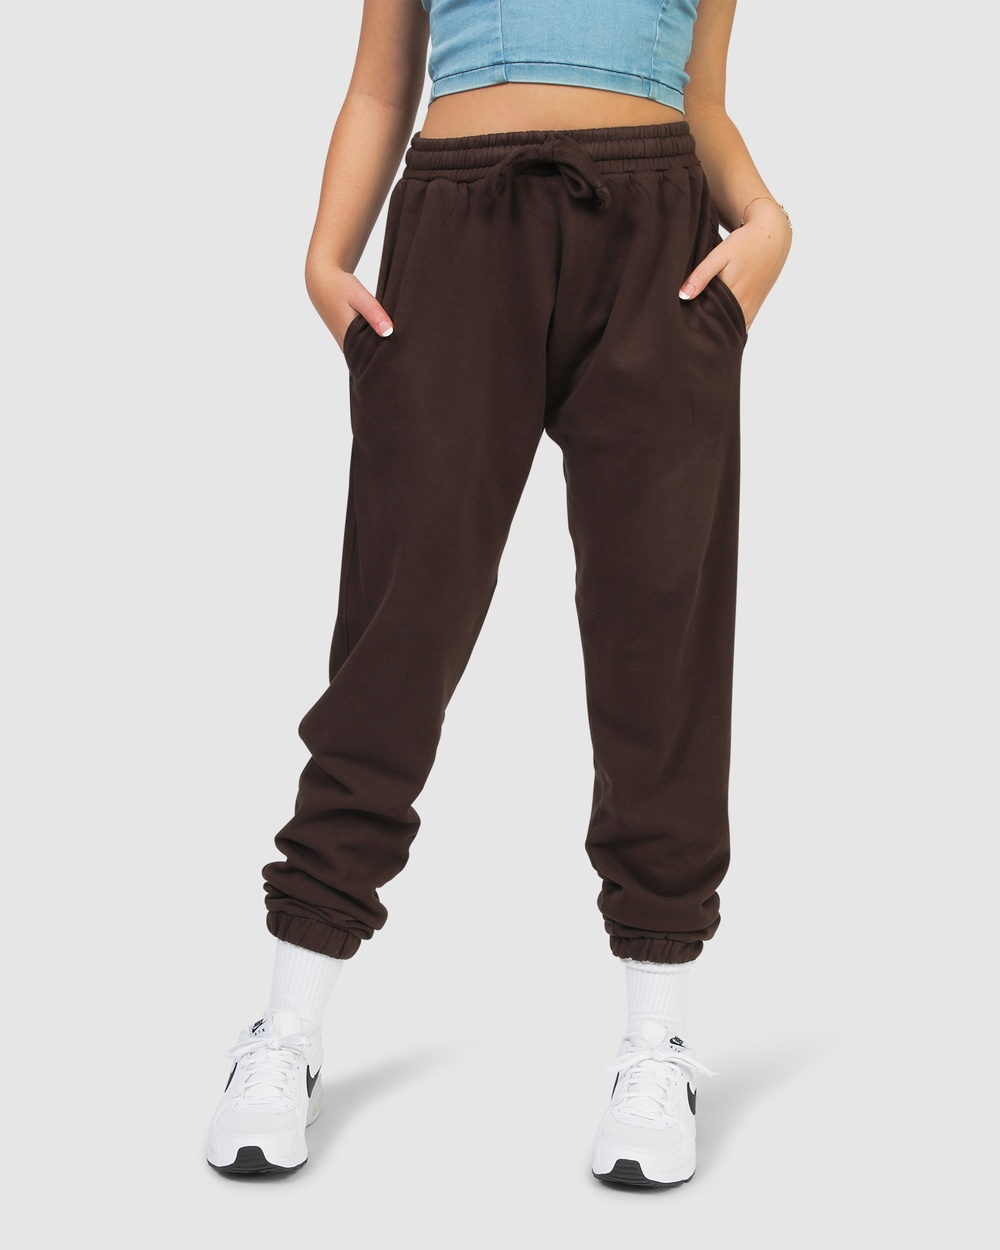 Gelati Jeans Kids Bounty Bear Track Pants Sweatpants Chocolate Brown Australia